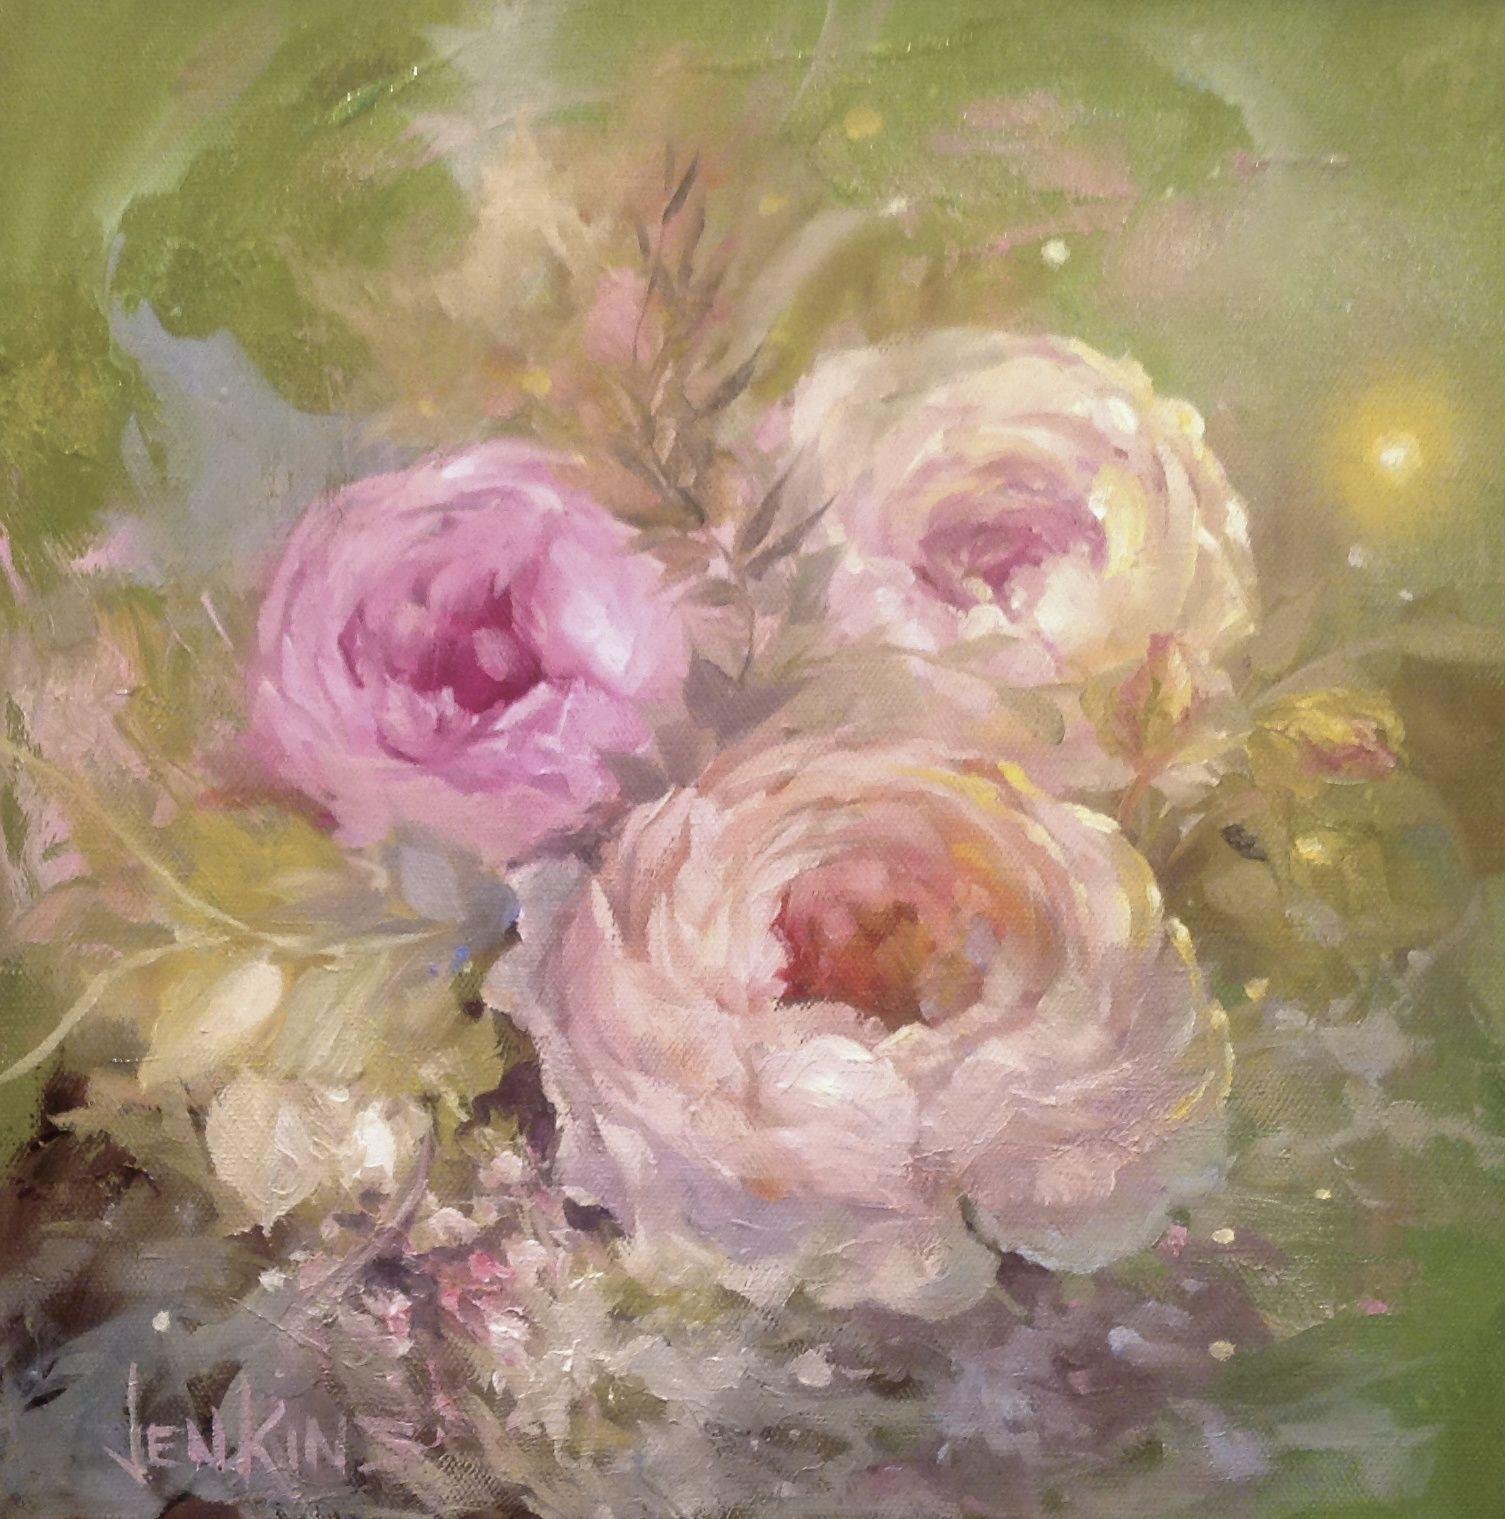 Galeria De Pintura Al Oleo: Belleza De La Pintura Al